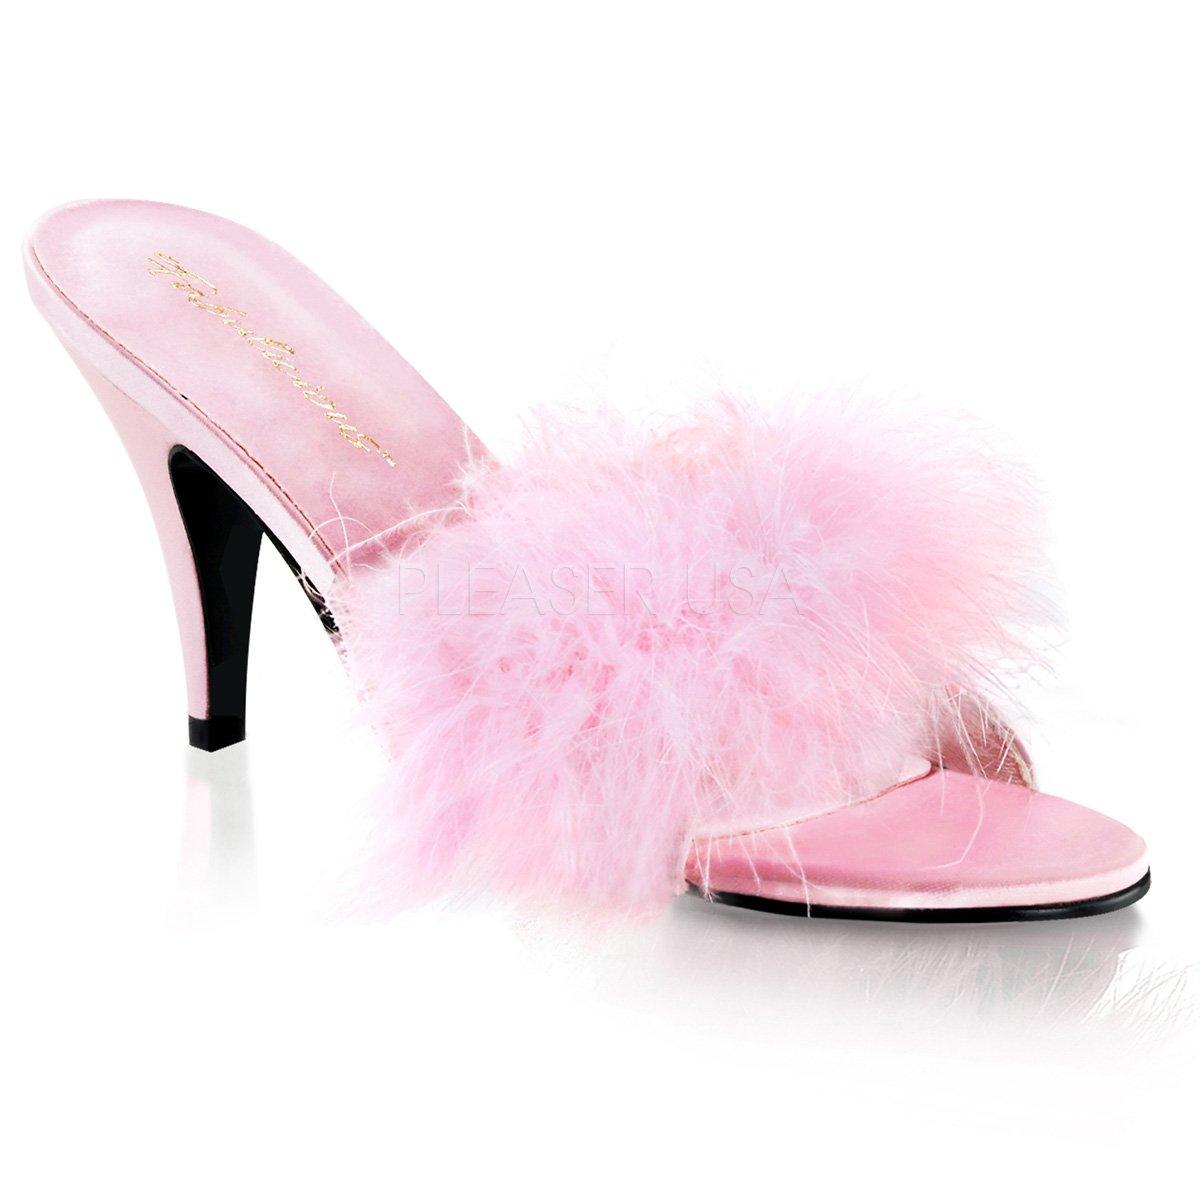 Pleaser Women's Amour-03 Sandal B00HVA1DLC 9 B(M) US|Baby Pink Satin-fur